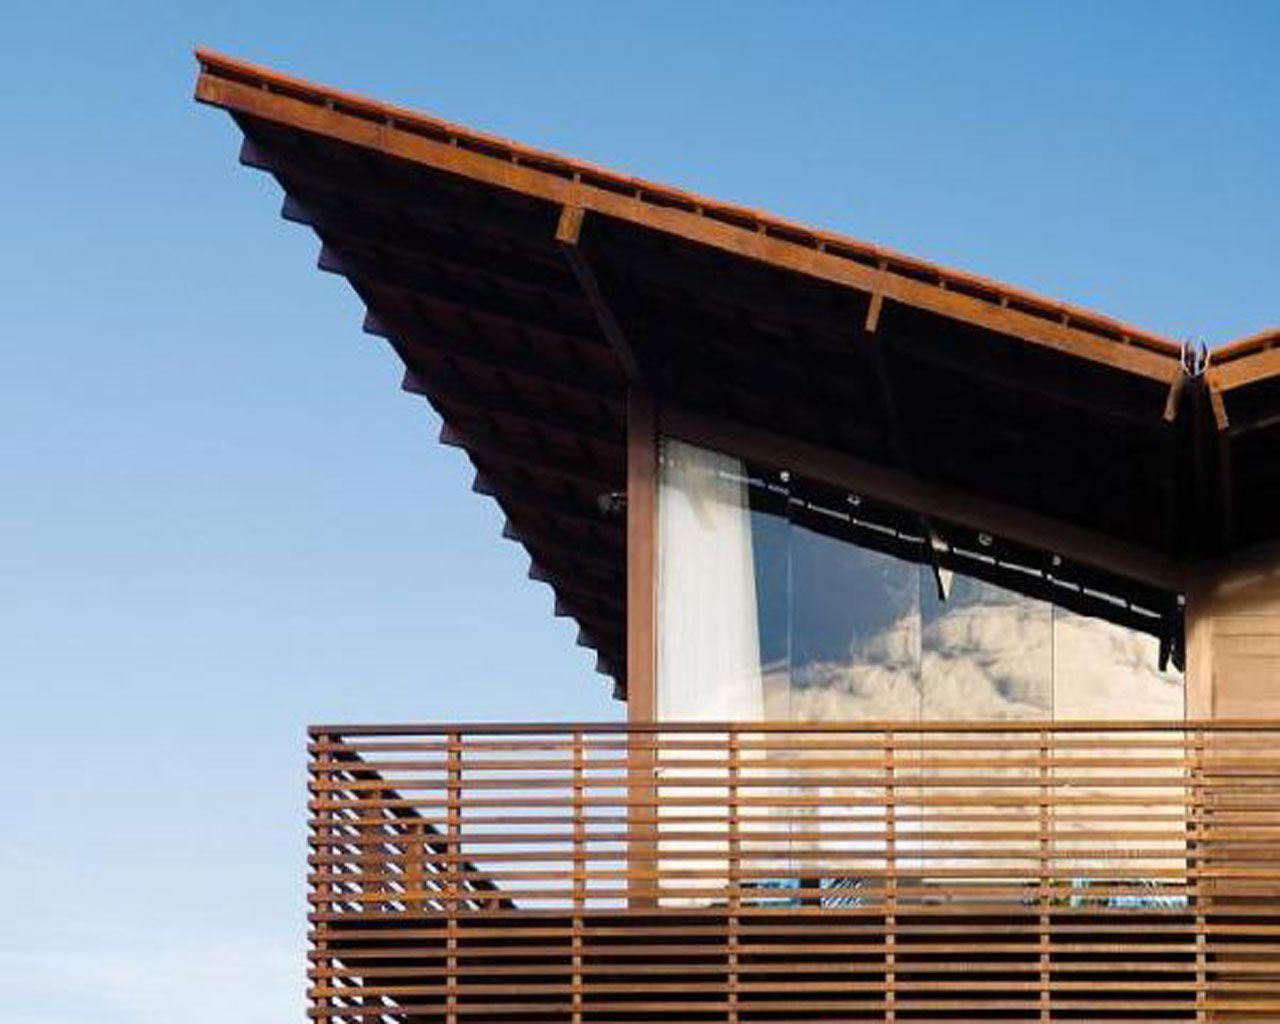 roof railing design ideas latest - Zion Star